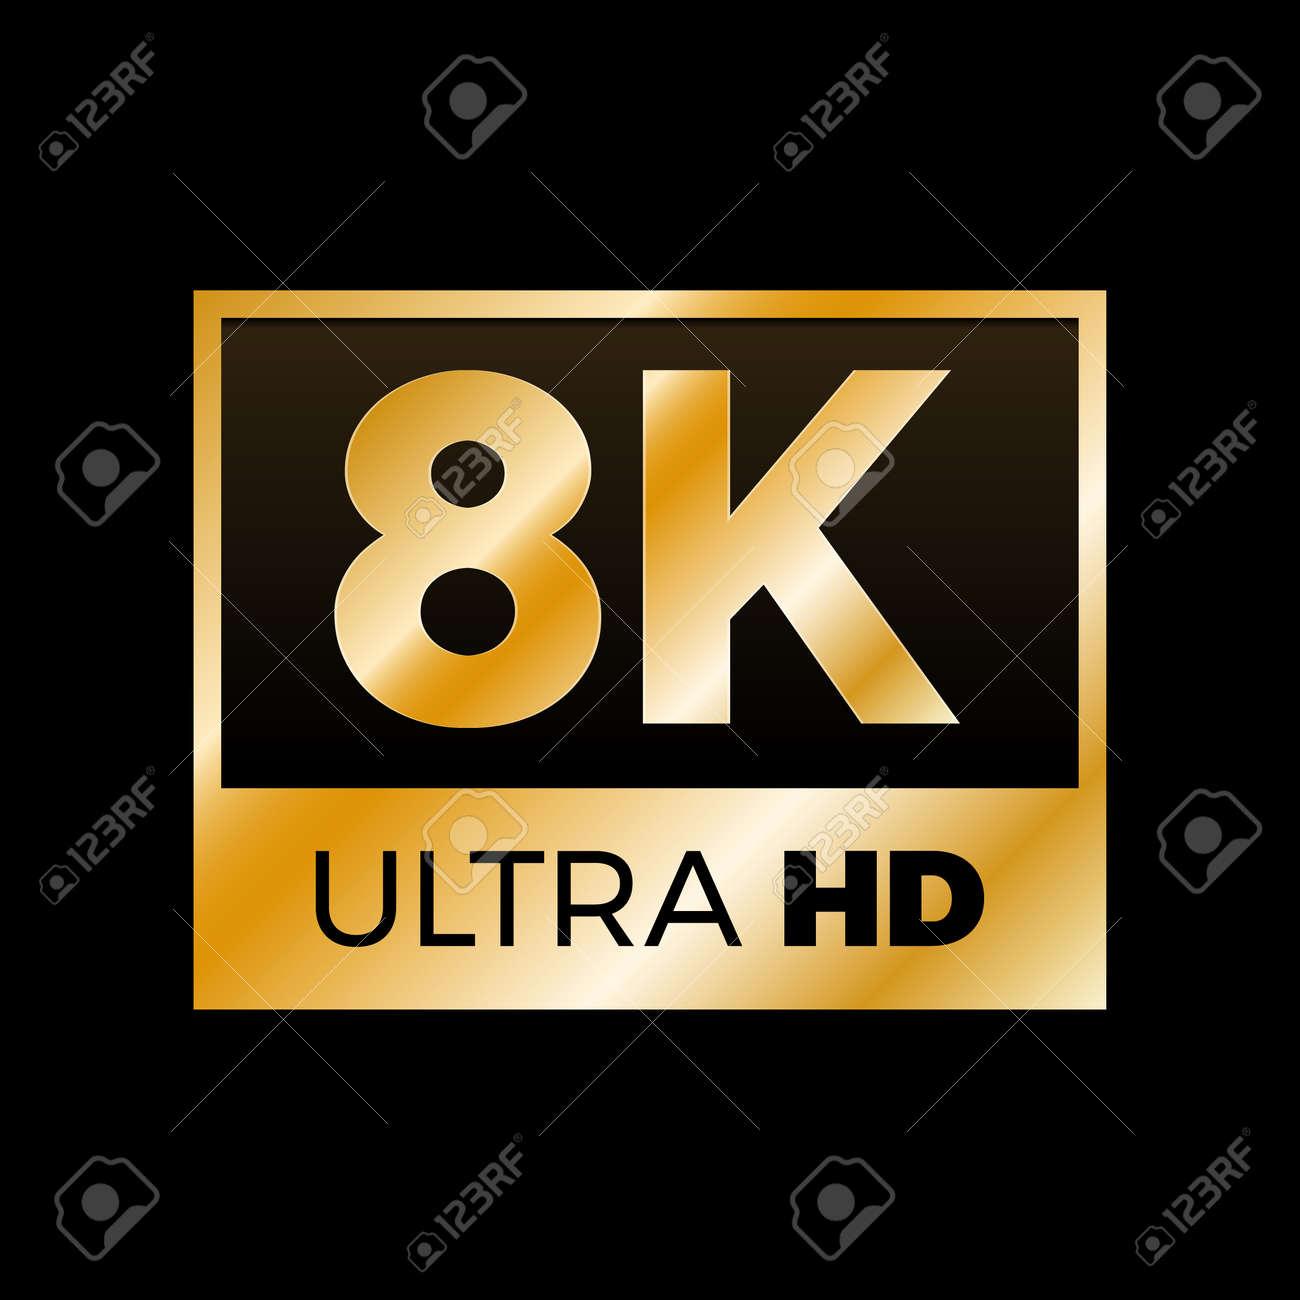 8k ultra hd symbol, high definition 8k resolution mark, royalty free